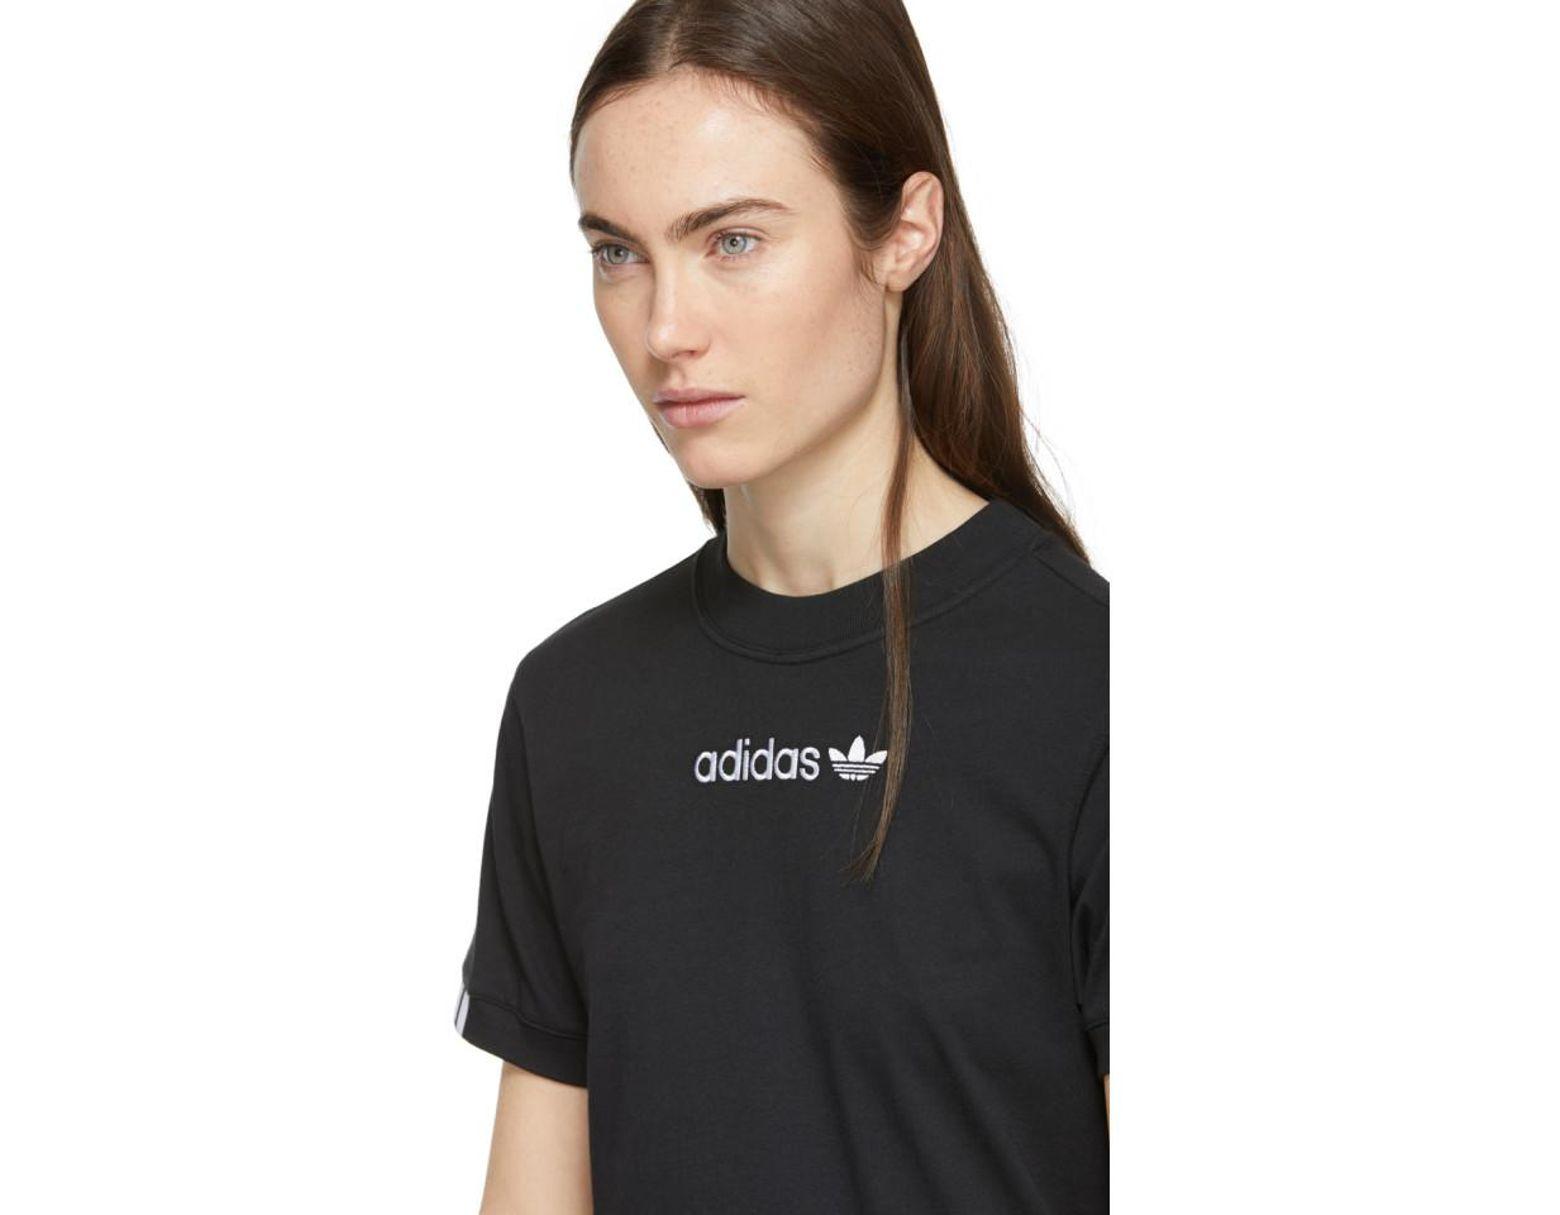 premium selection 253c1 62750 adidas Originals Black Coeeze T-shirt in Black - Lyst